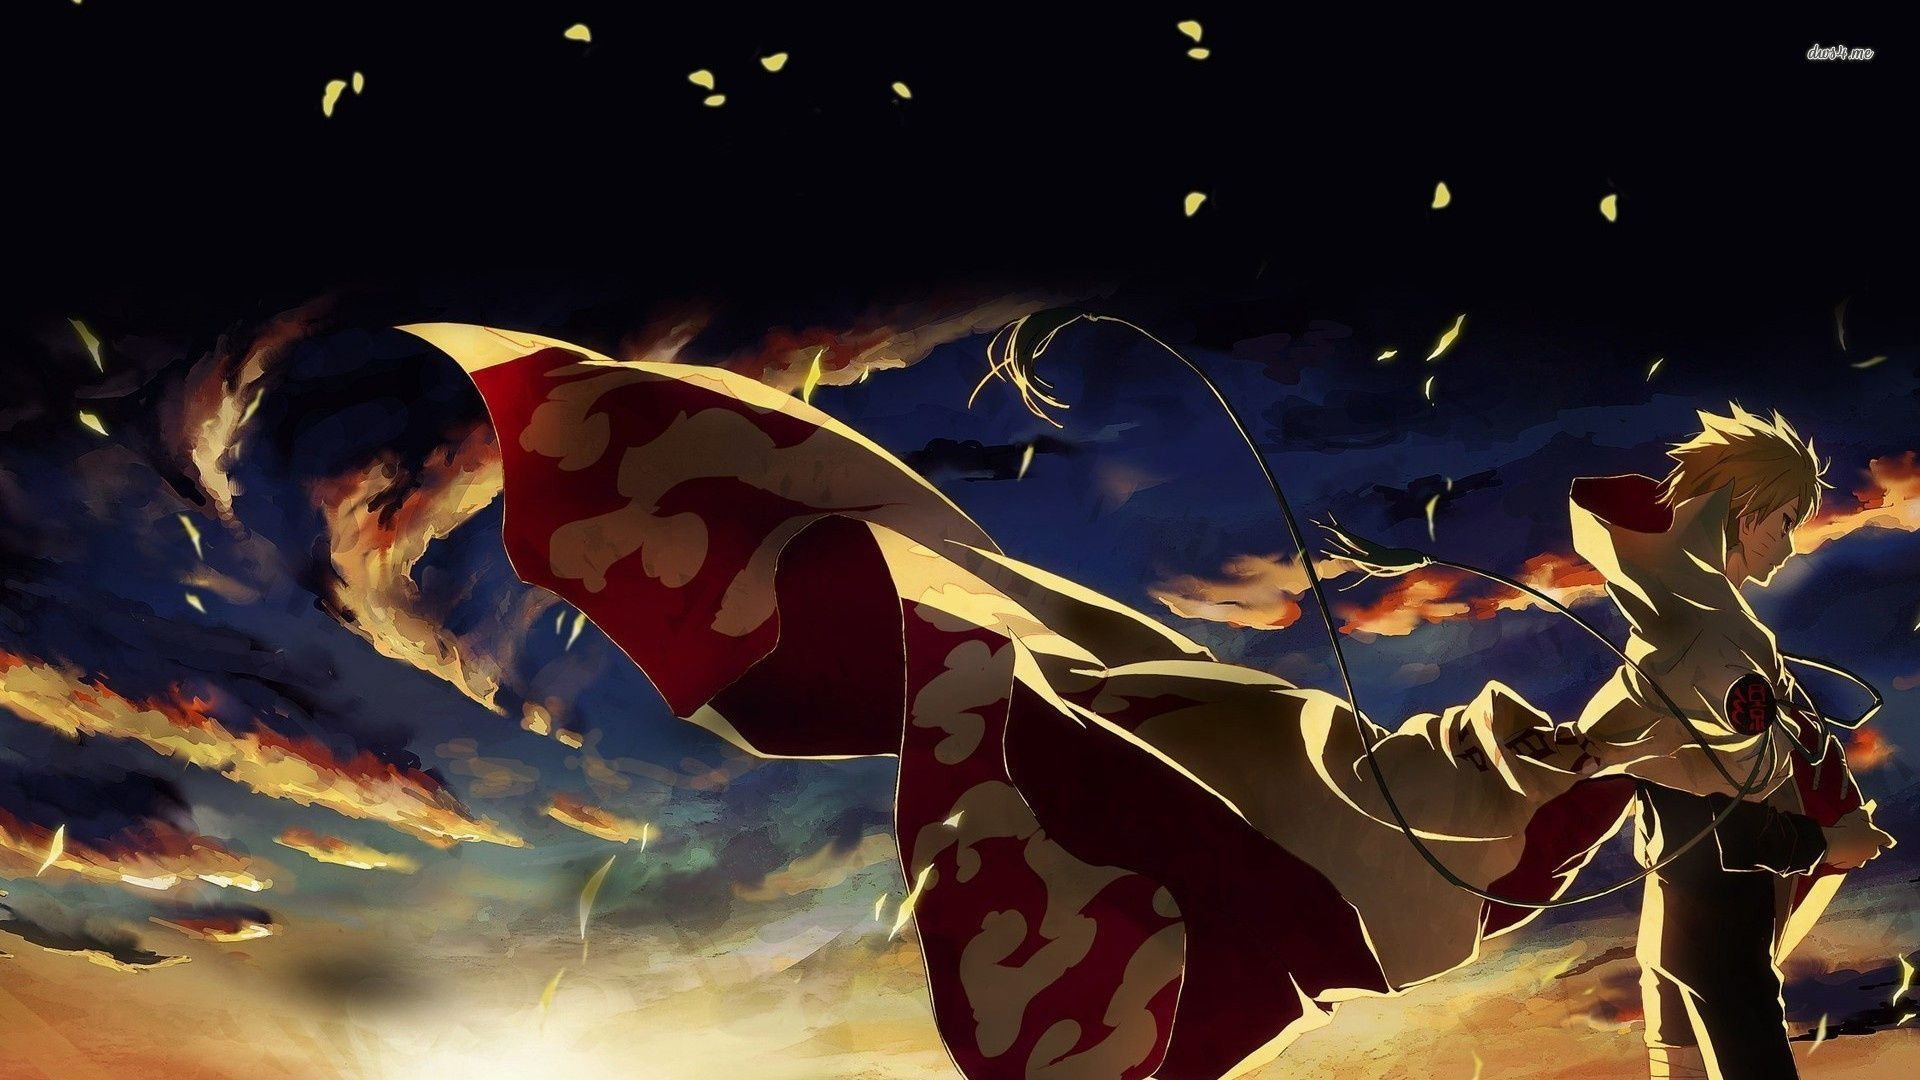 Anime Best Wallpapers Hd Best Naruto Wallpaper Hd 2017